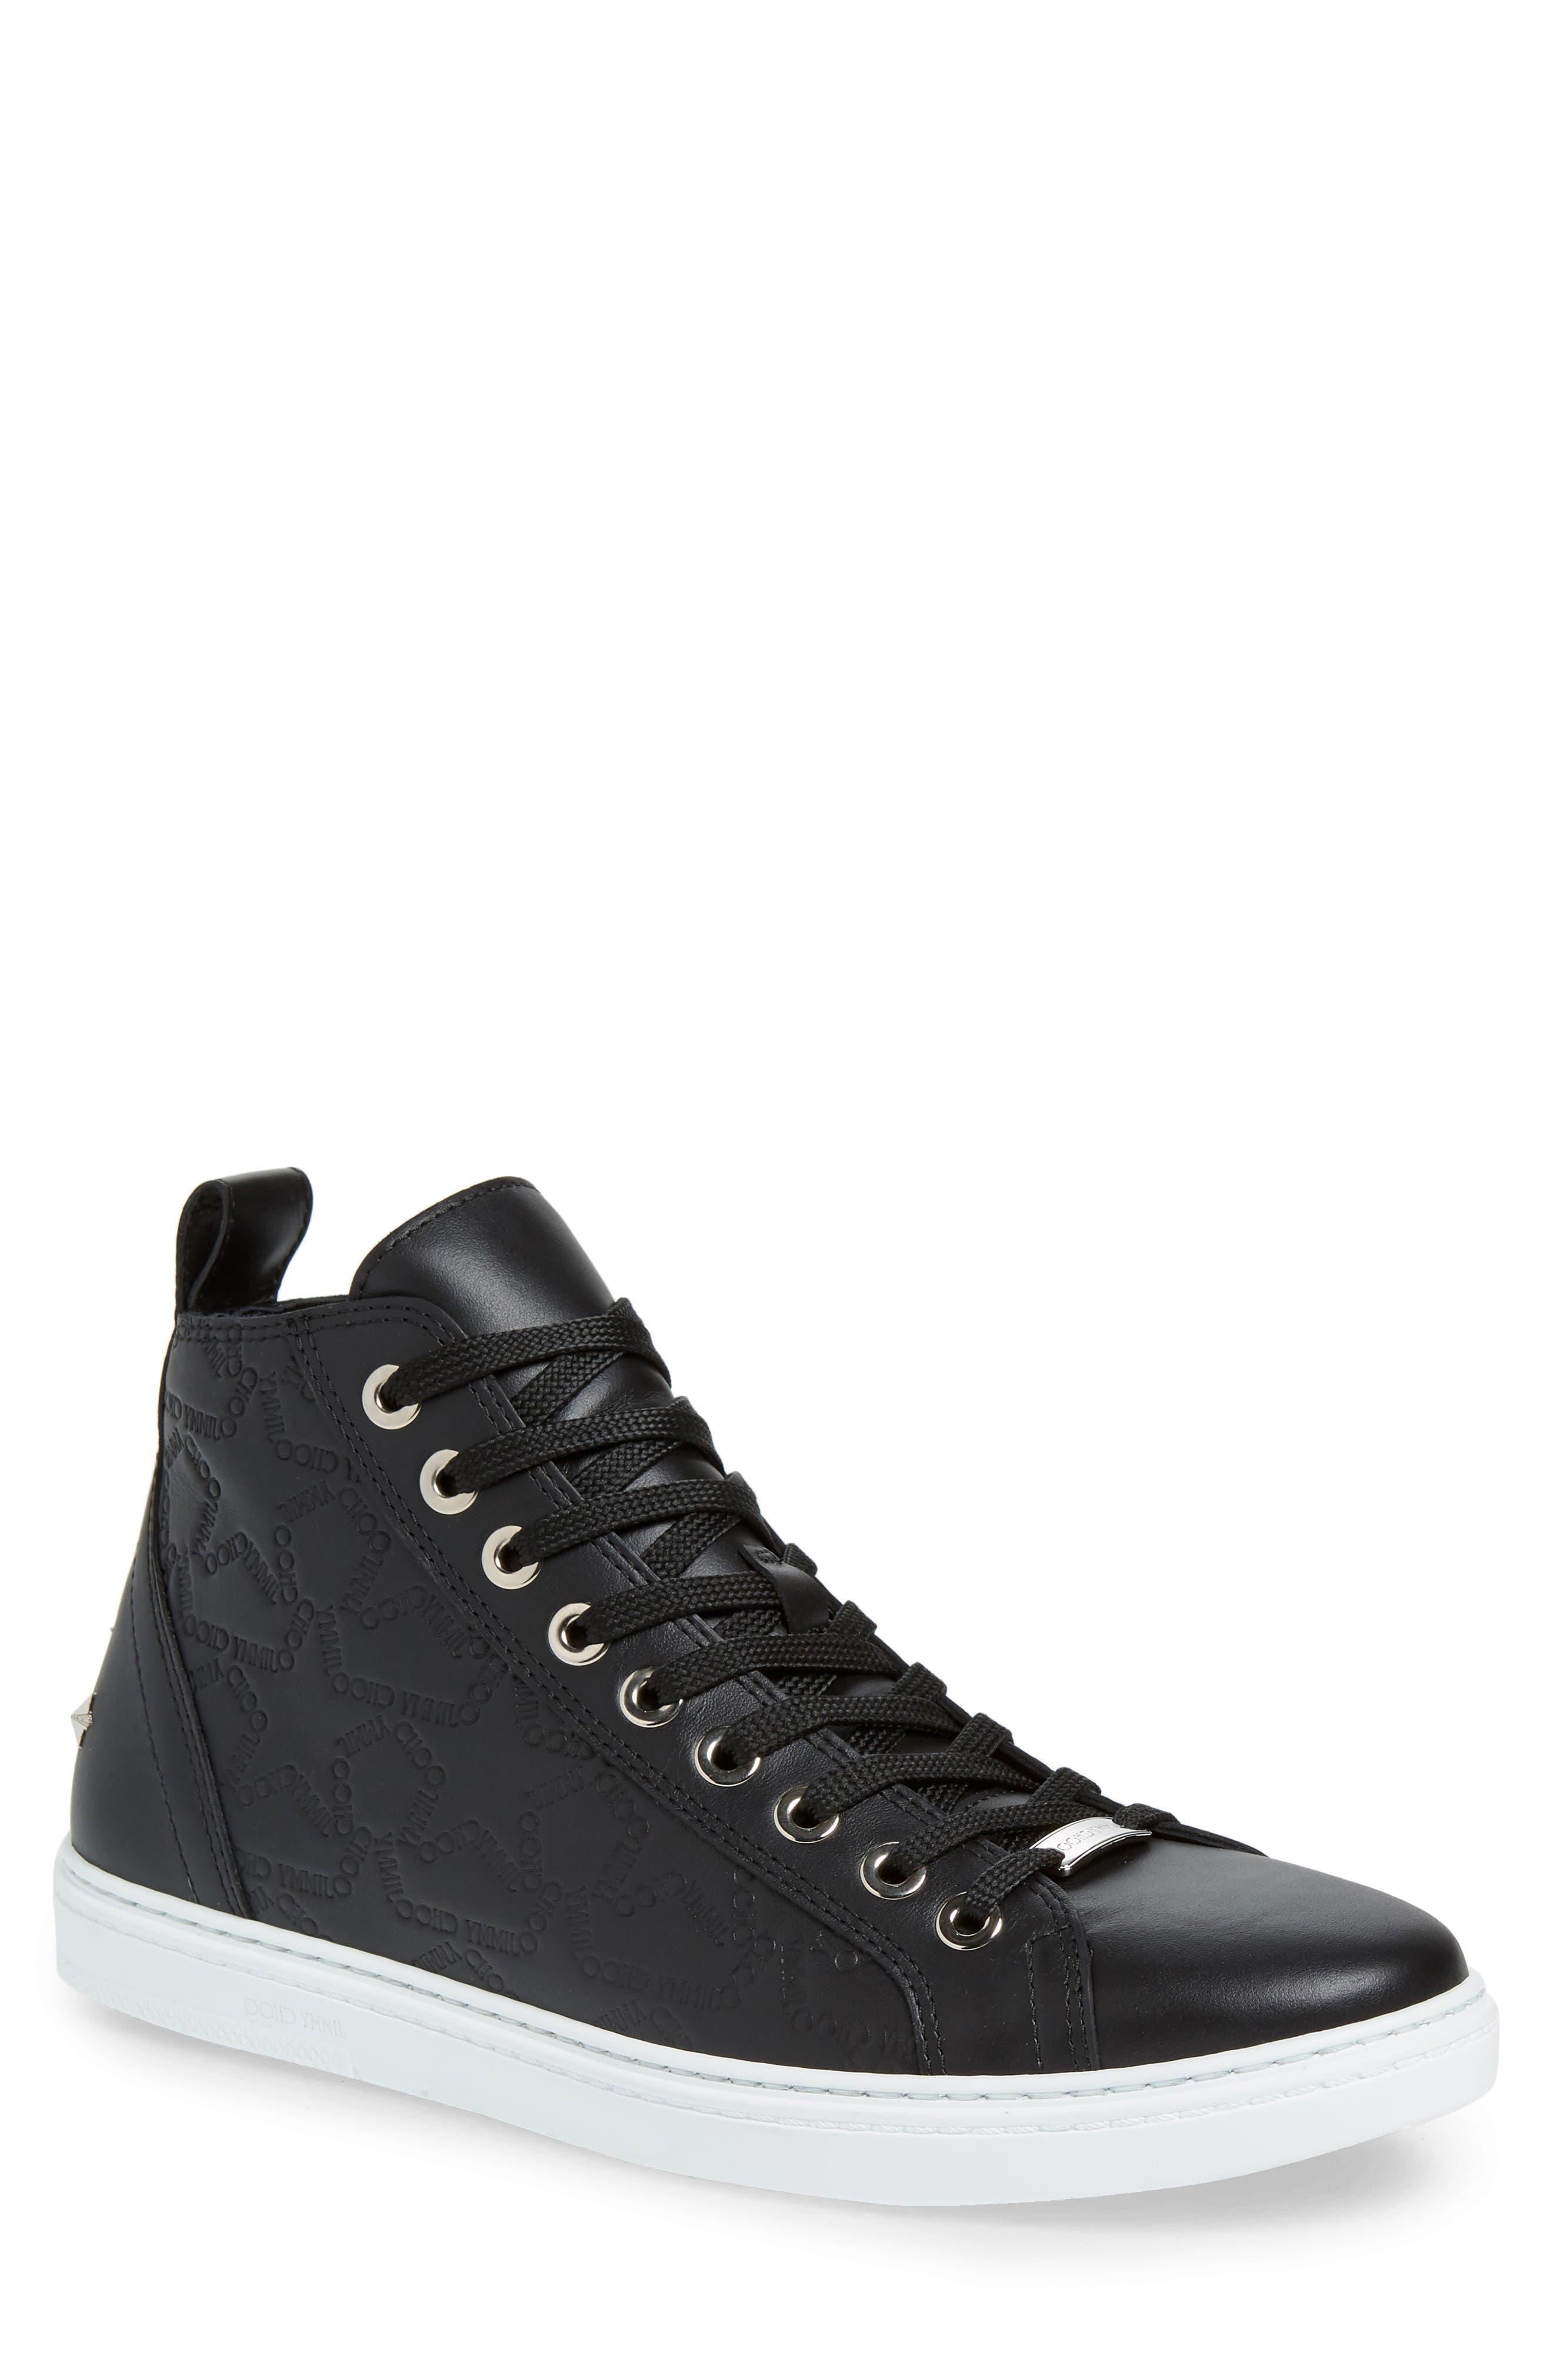 Colt High Top Sneaker,                             Main thumbnail 1, color,                             001